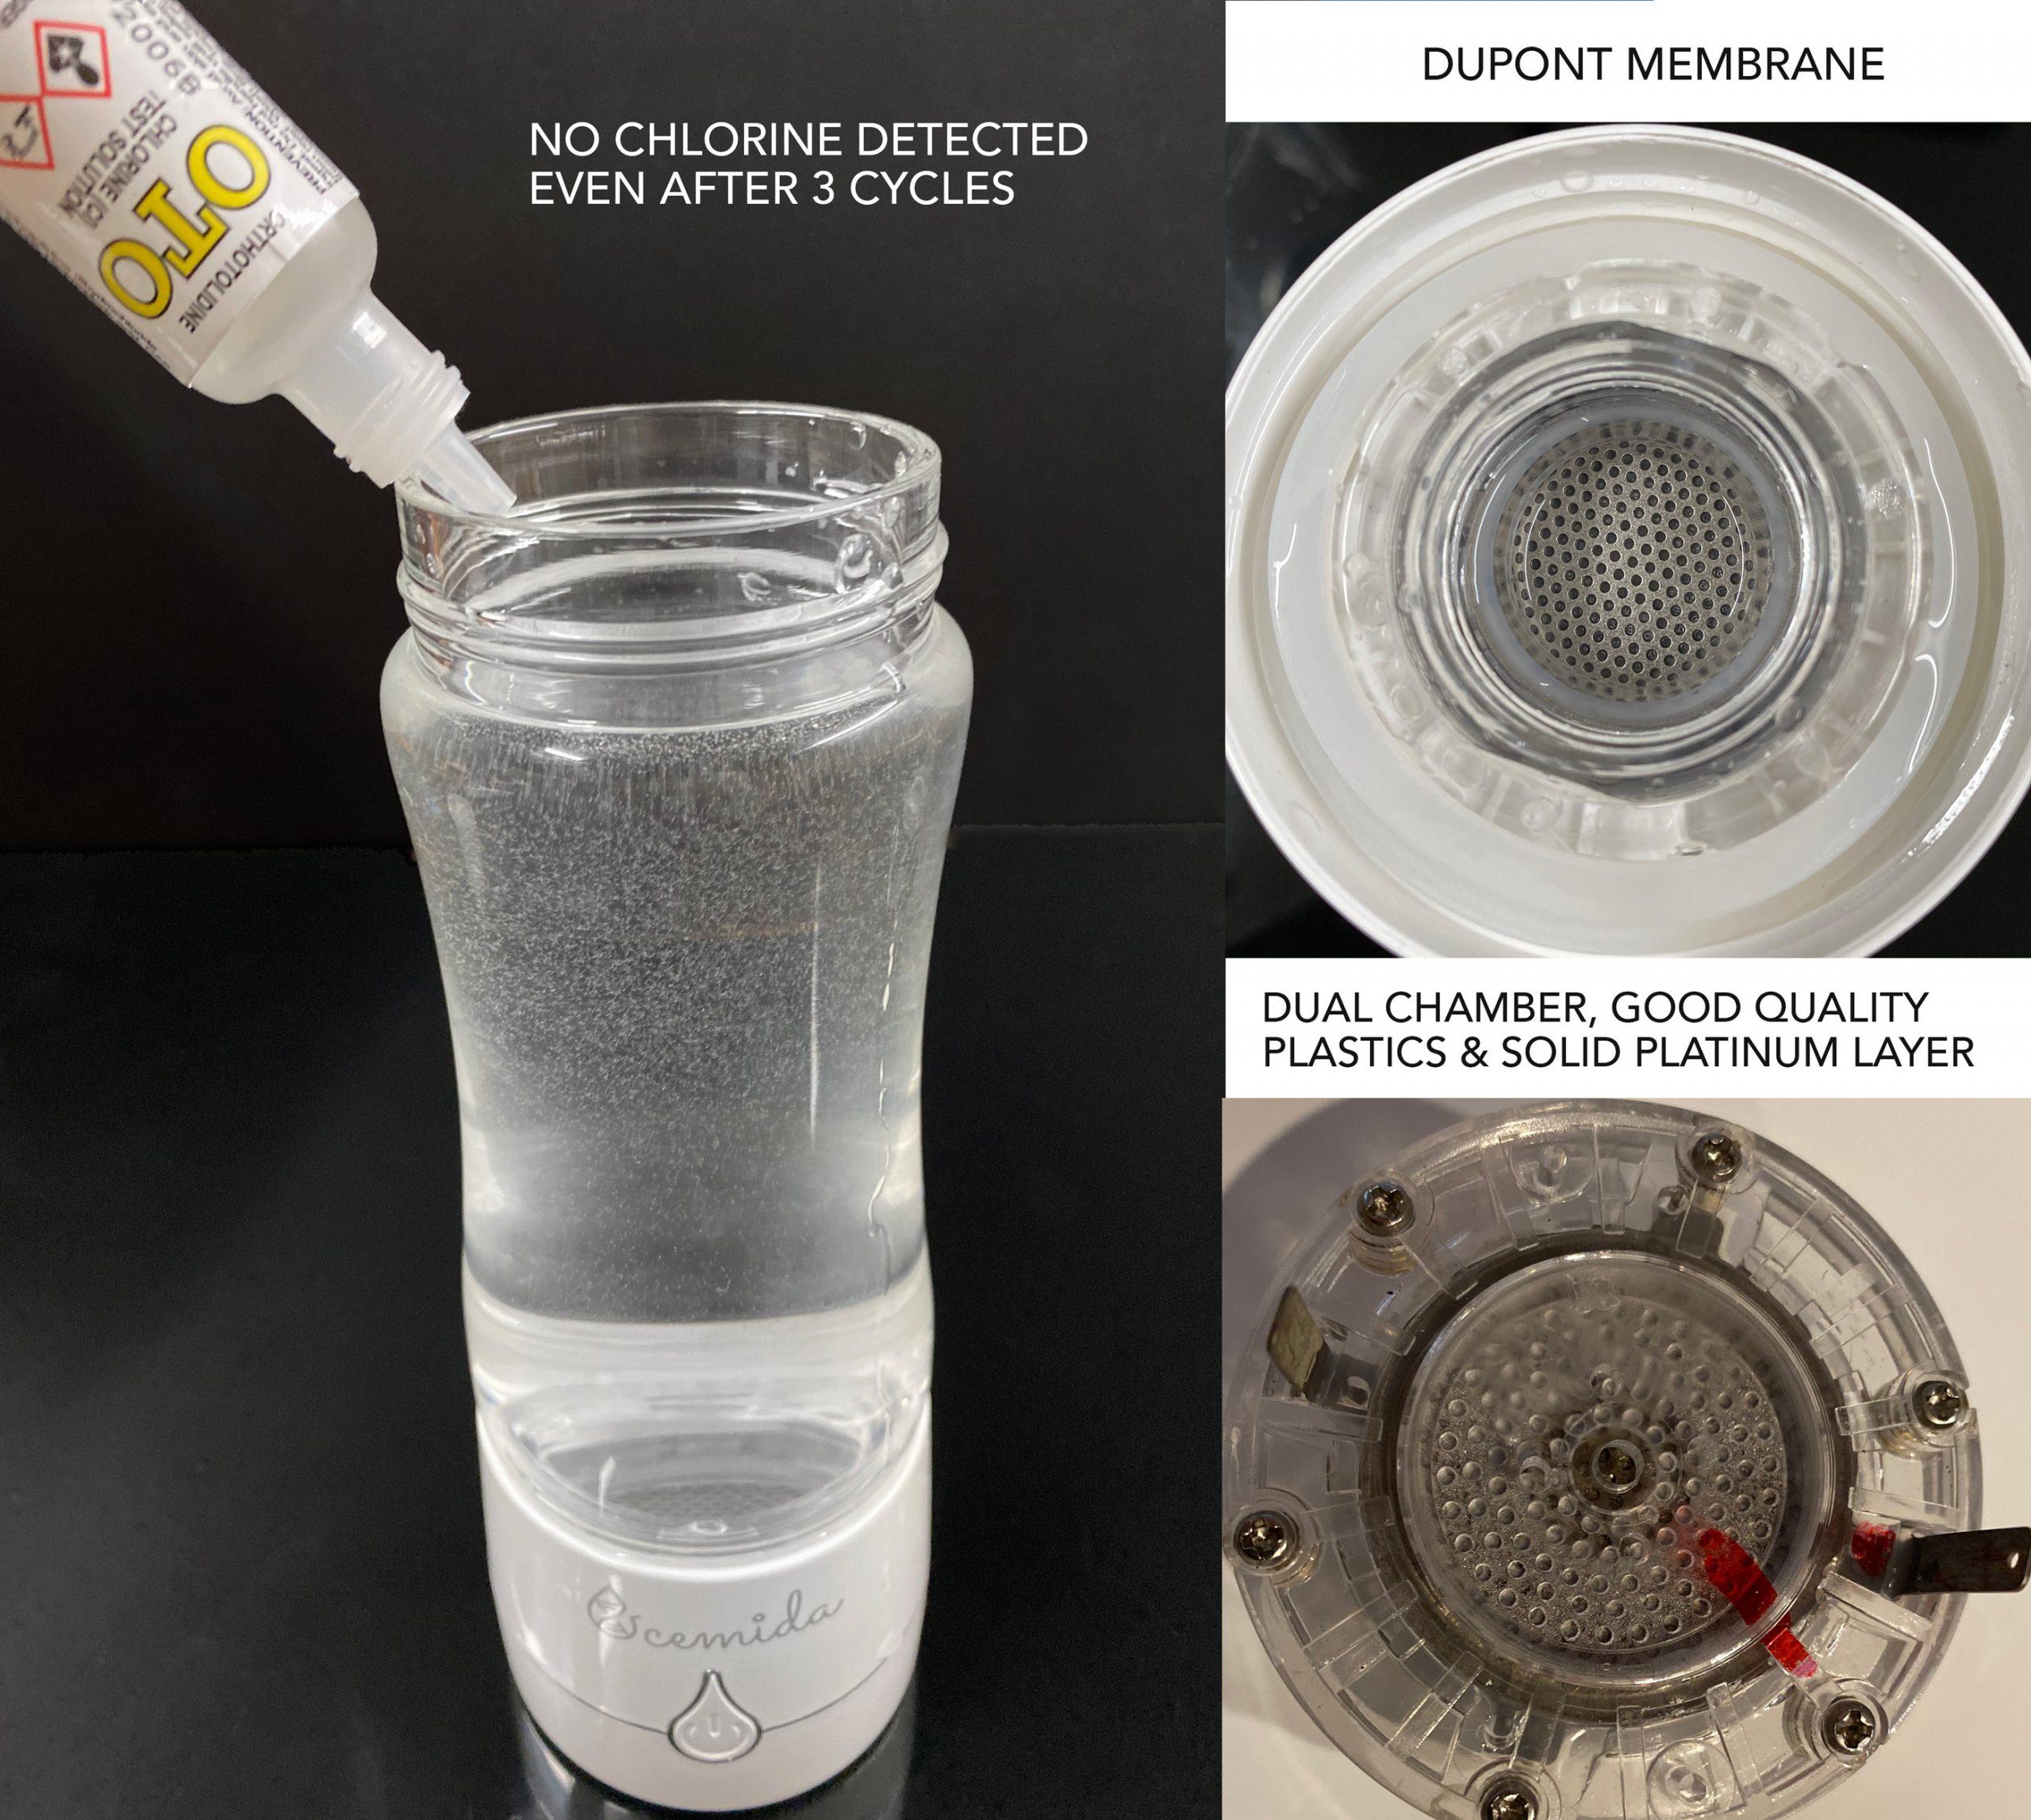 Ocemida Chrlorine test scaled